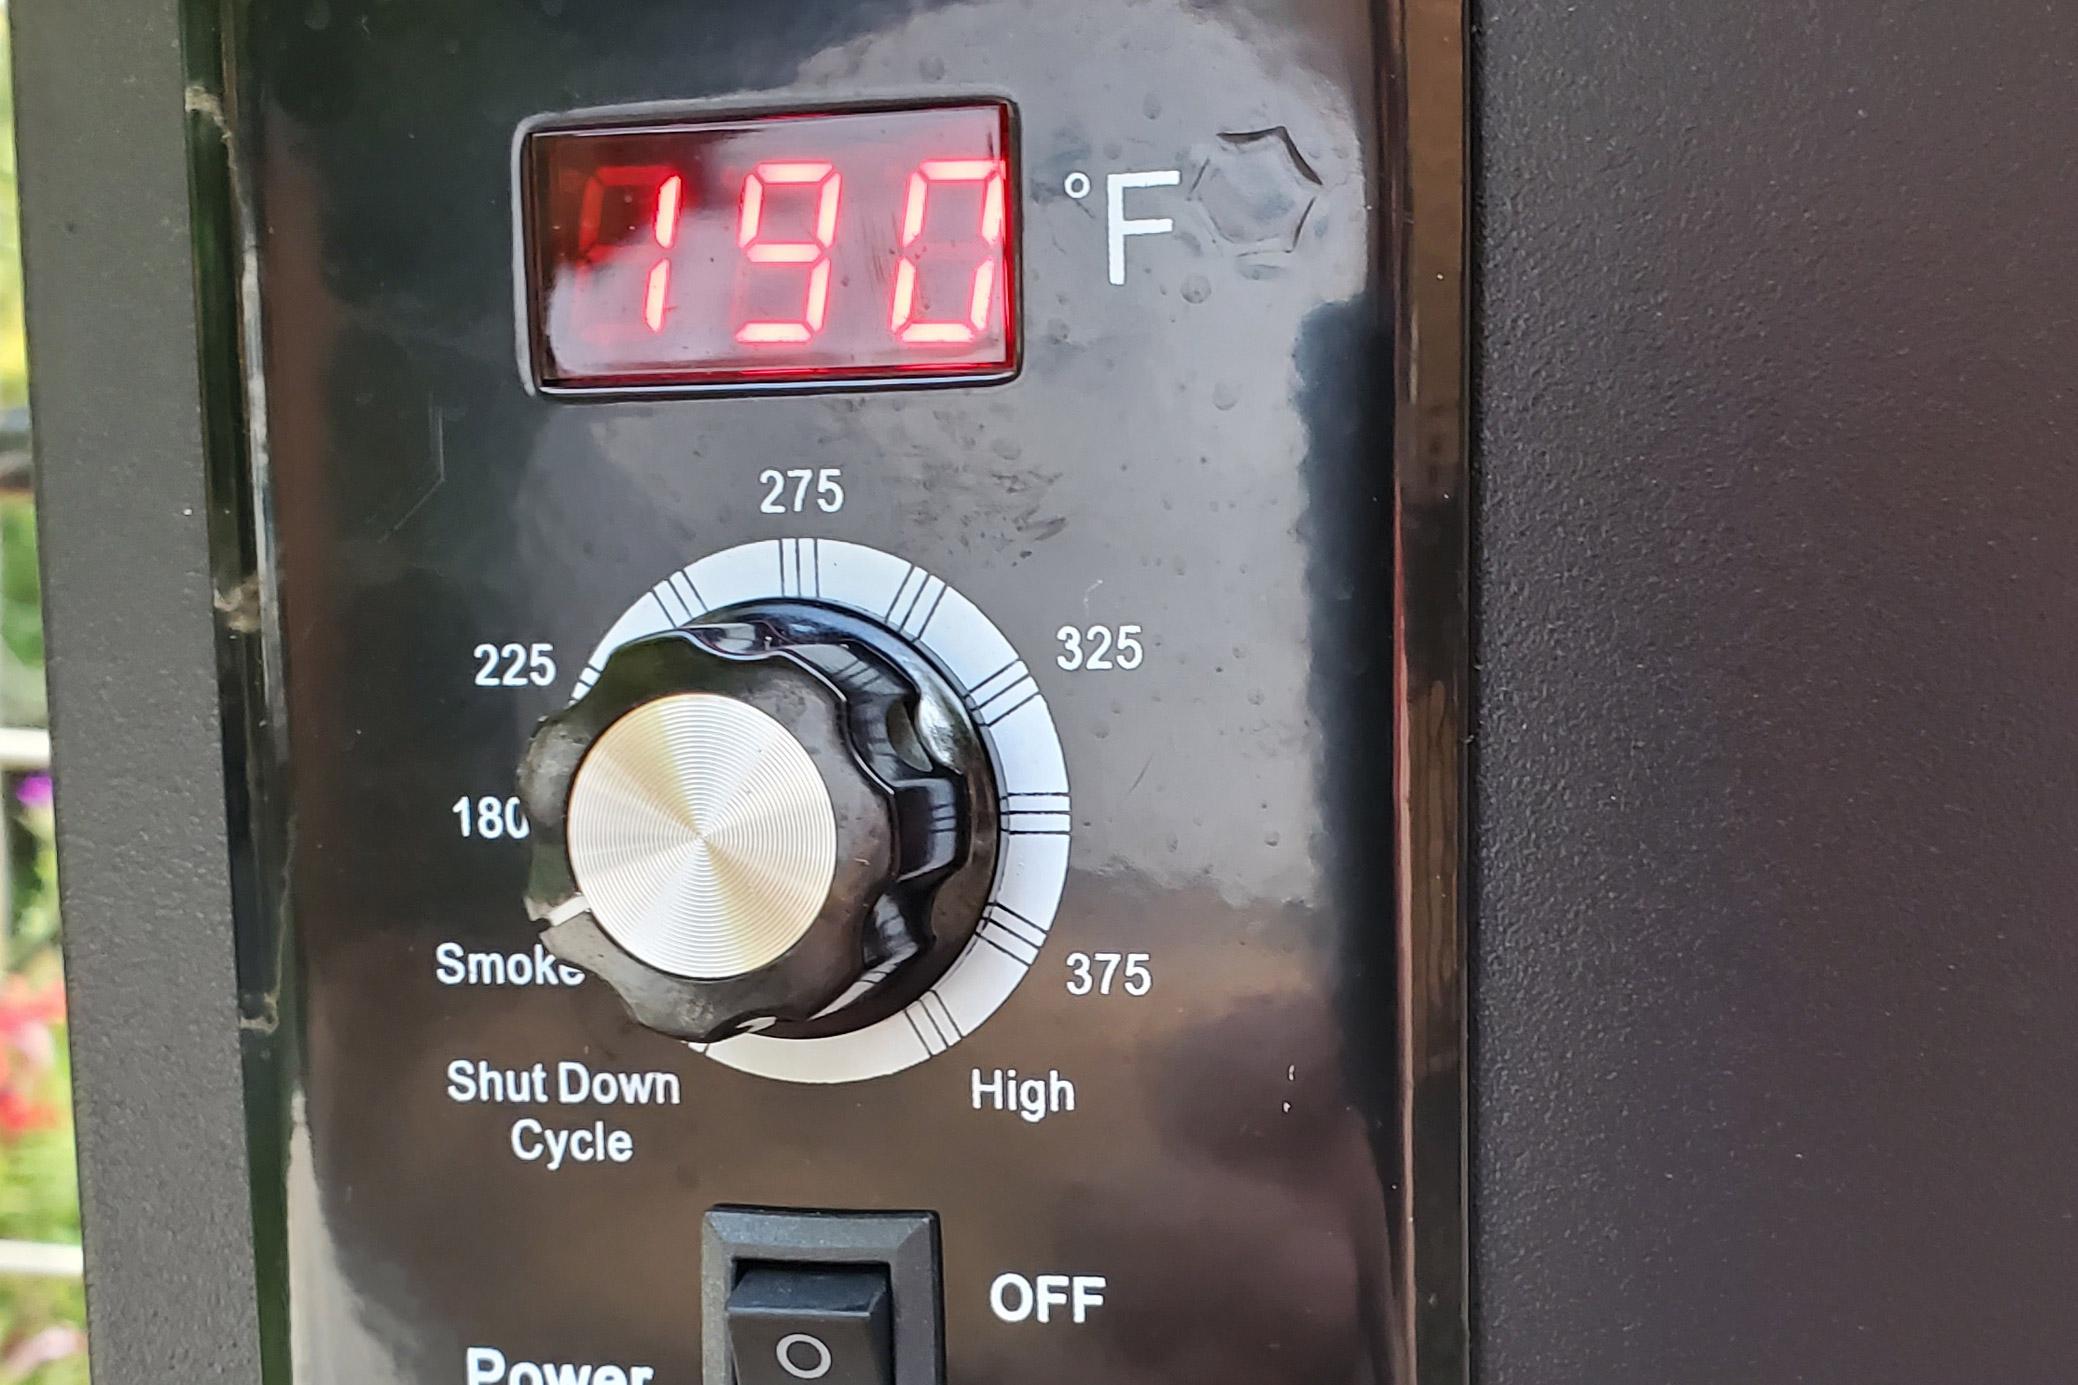 z grills flame elite 600d3e - temperature control